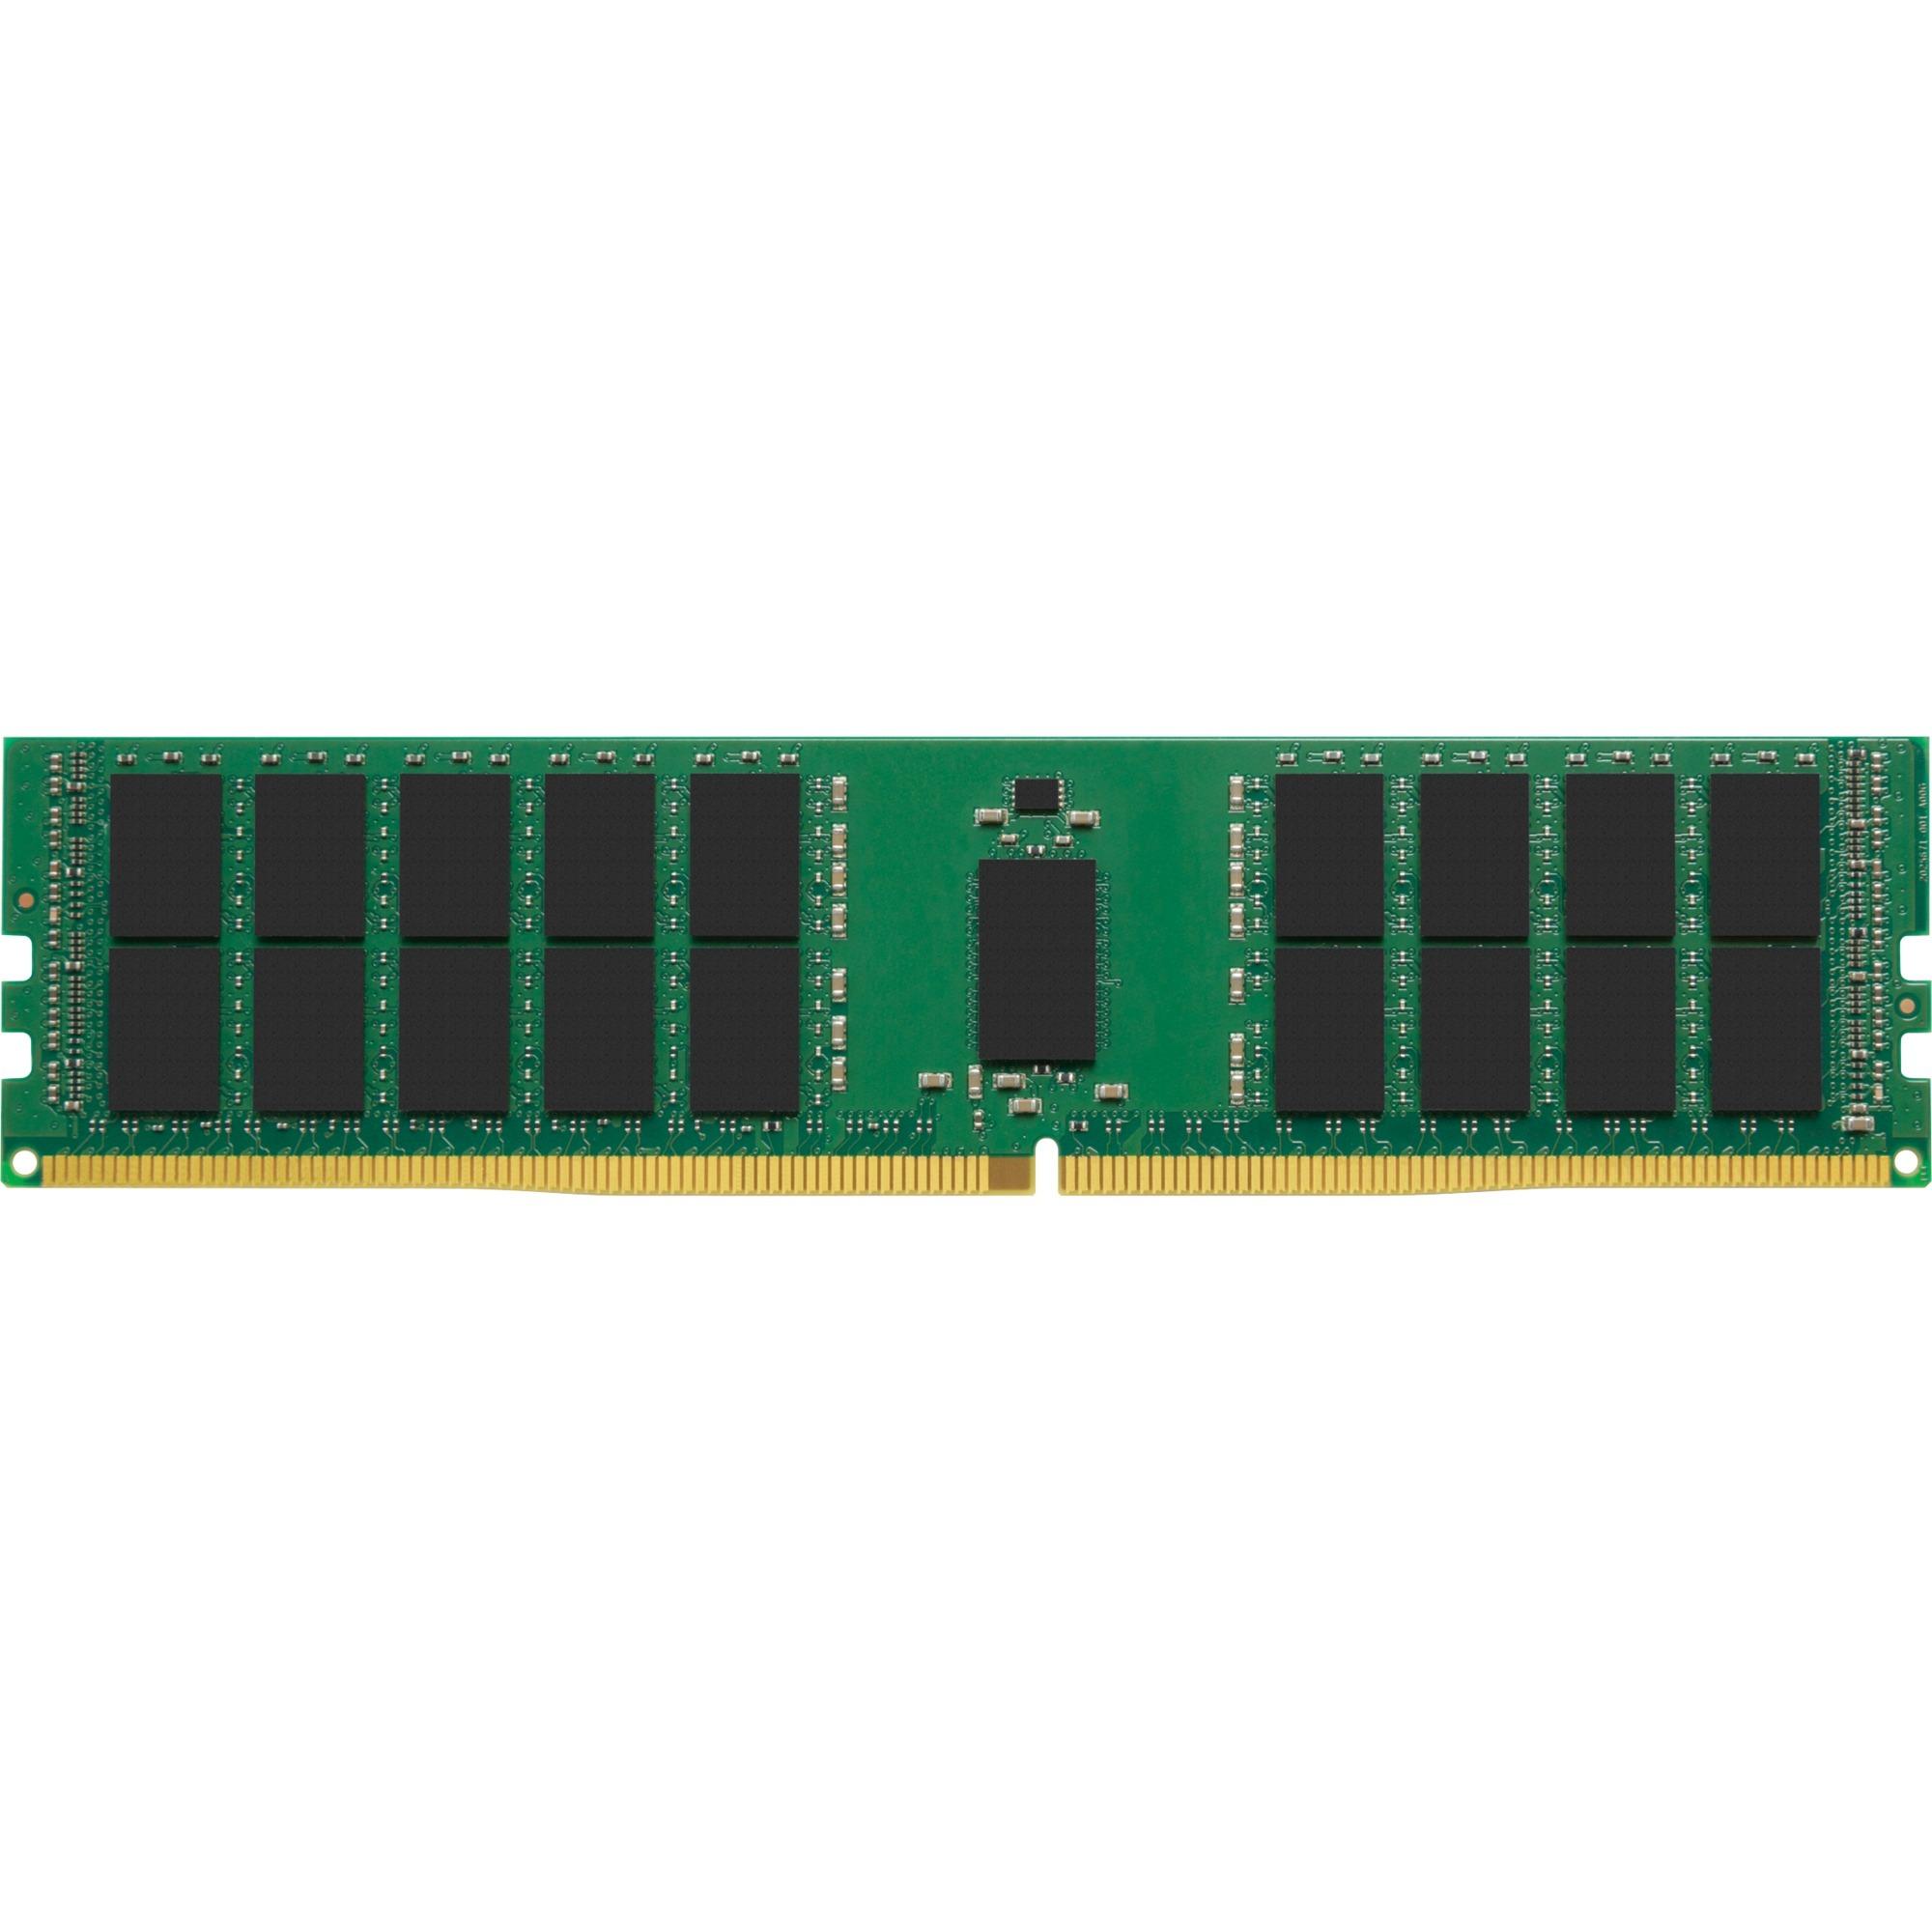 16GB DDR4, 2400 MHz módulo de memoria, Memoria RAM